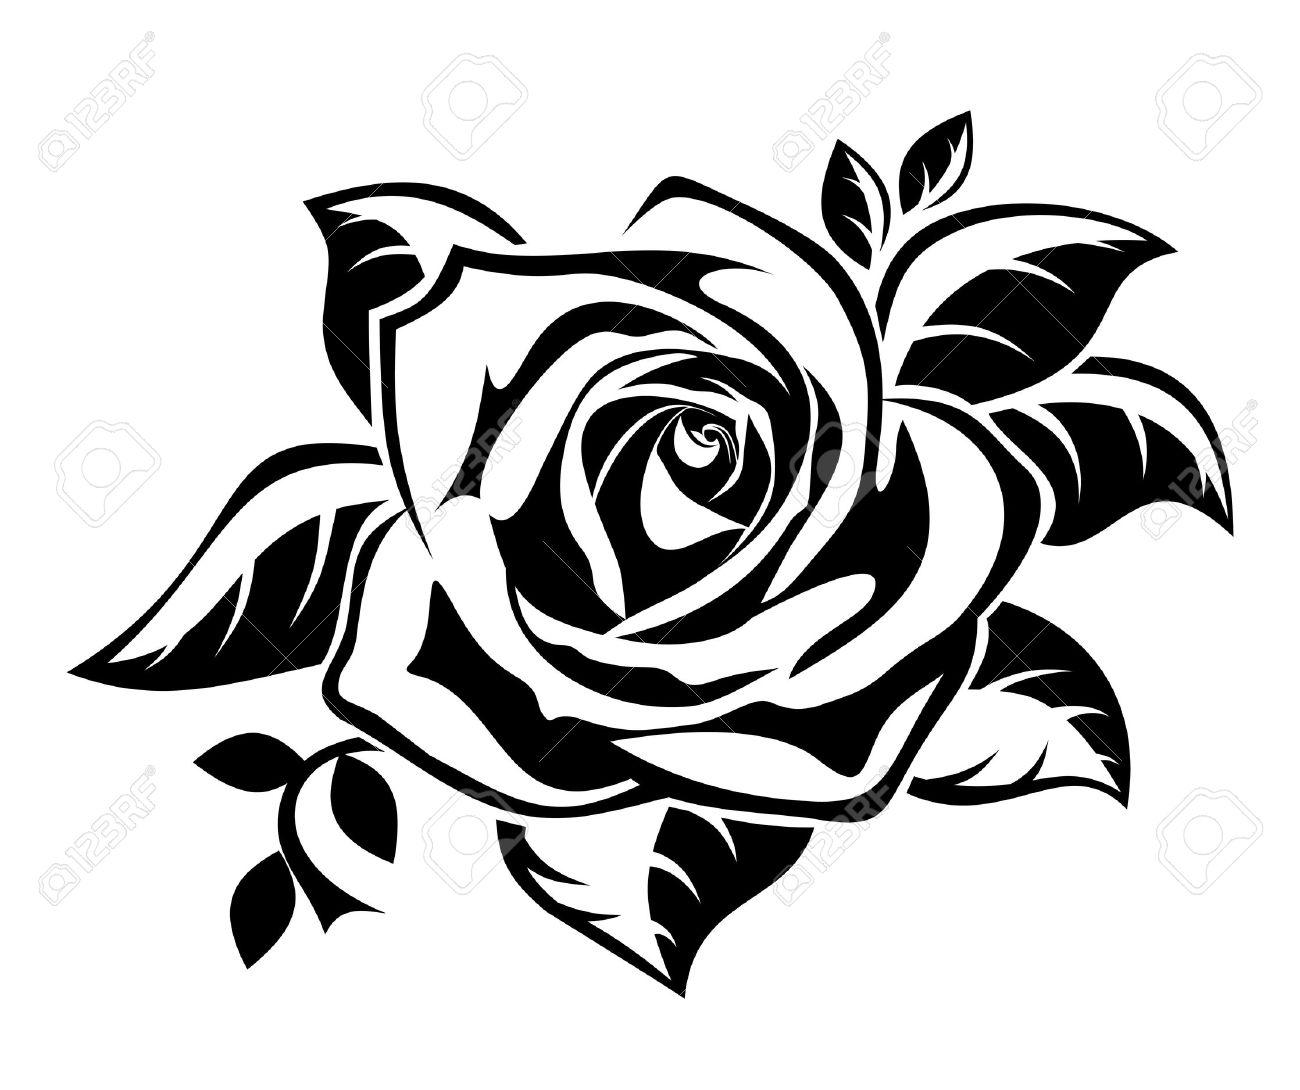 Rose vector clipart jpg royalty free Rose Vector Png | Free download best Rose Vector Png on ... jpg royalty free